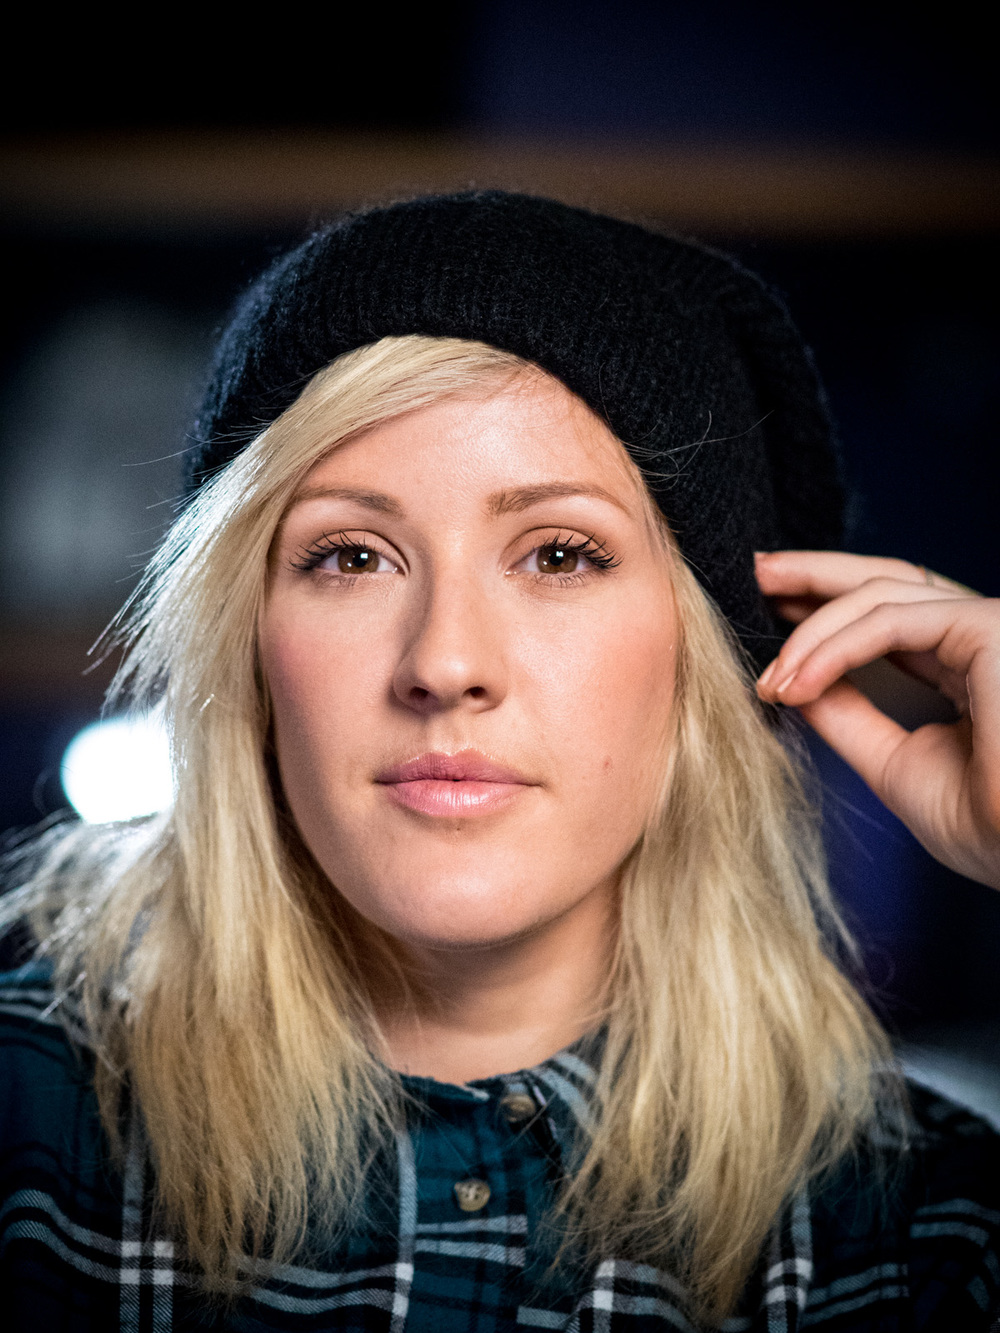 Ellie Goulding at Abbey Road Studios, London